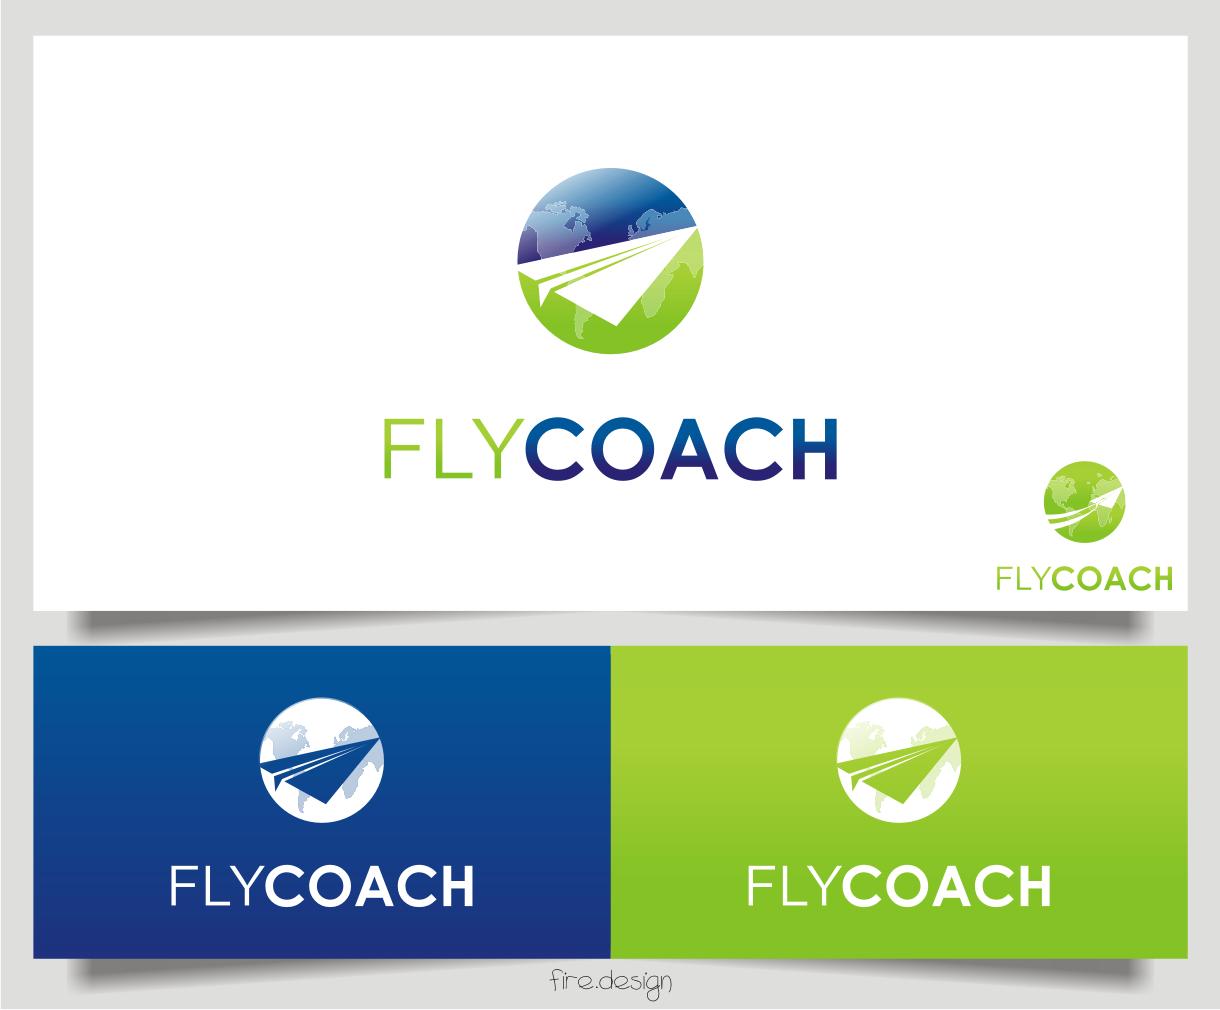 Fly Coach needs a new logo